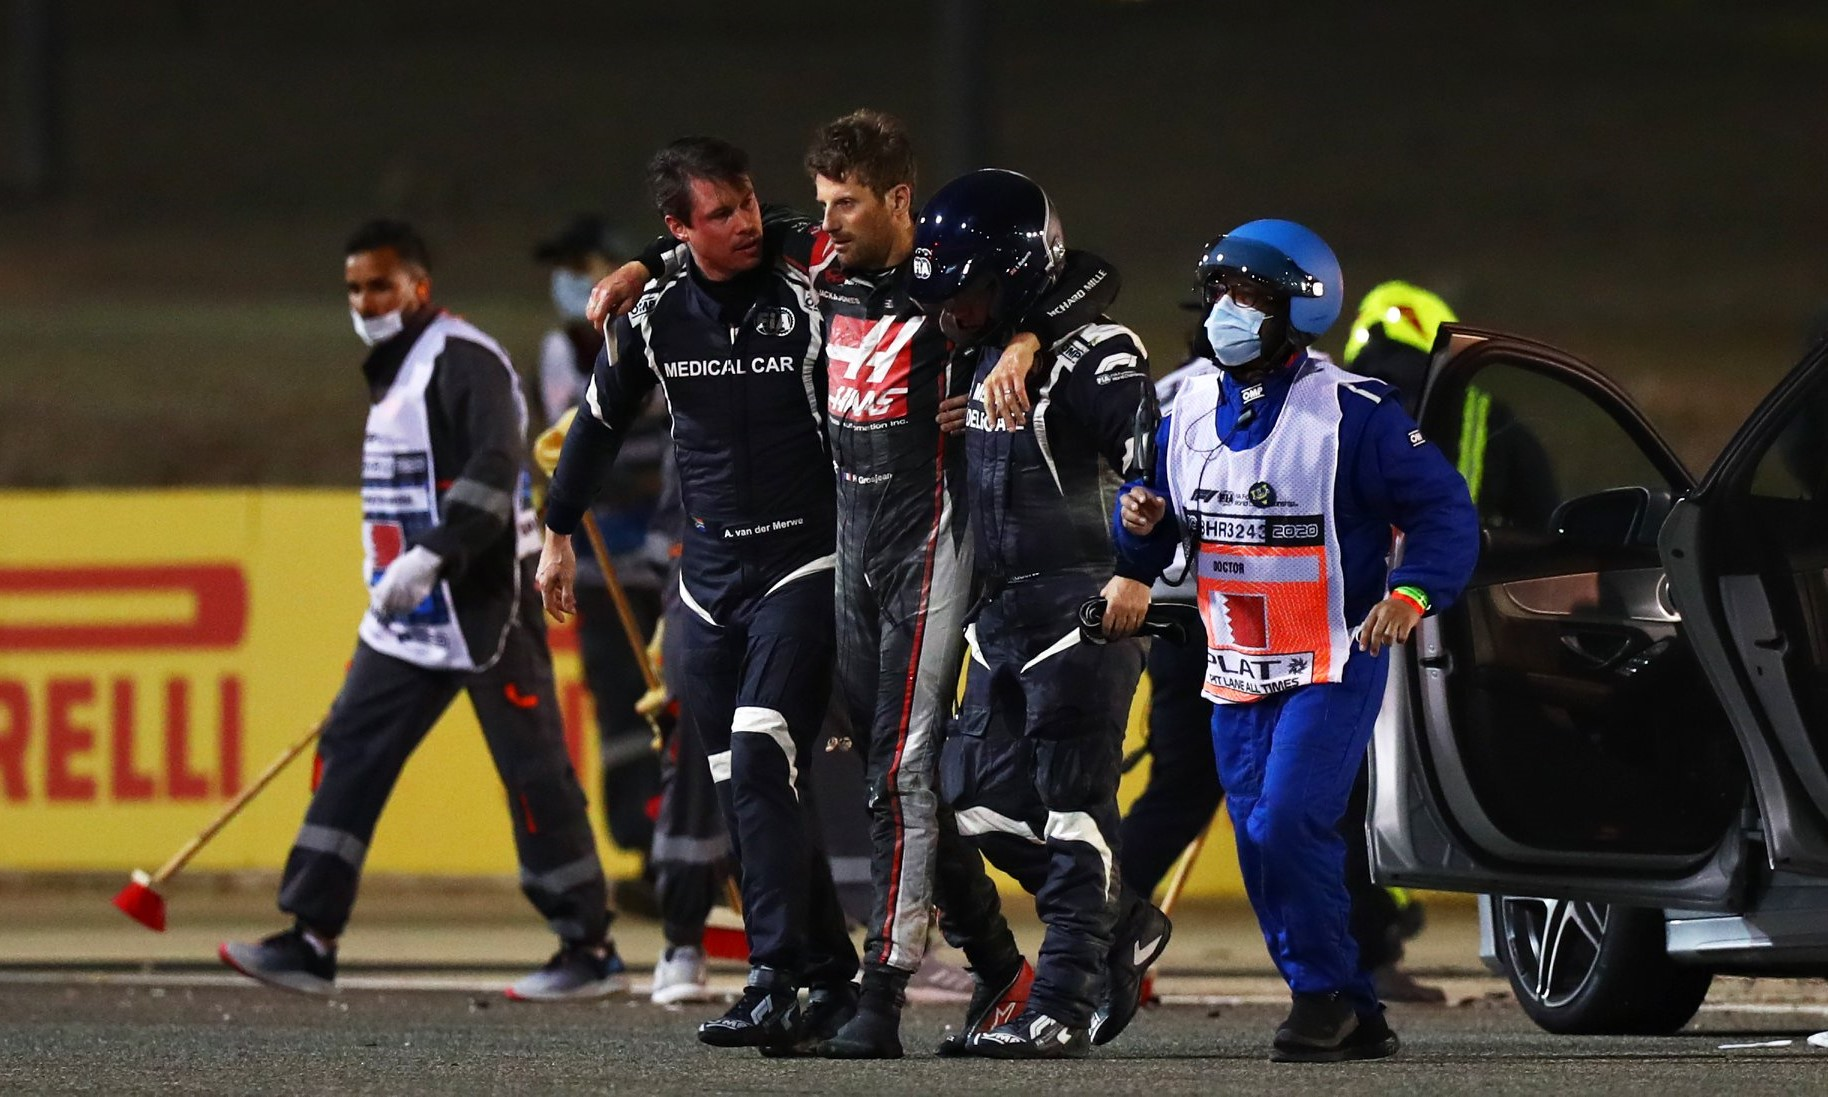 F1 Review Bahrain 2020 Romain Grosjean (Image F1 via facebook)